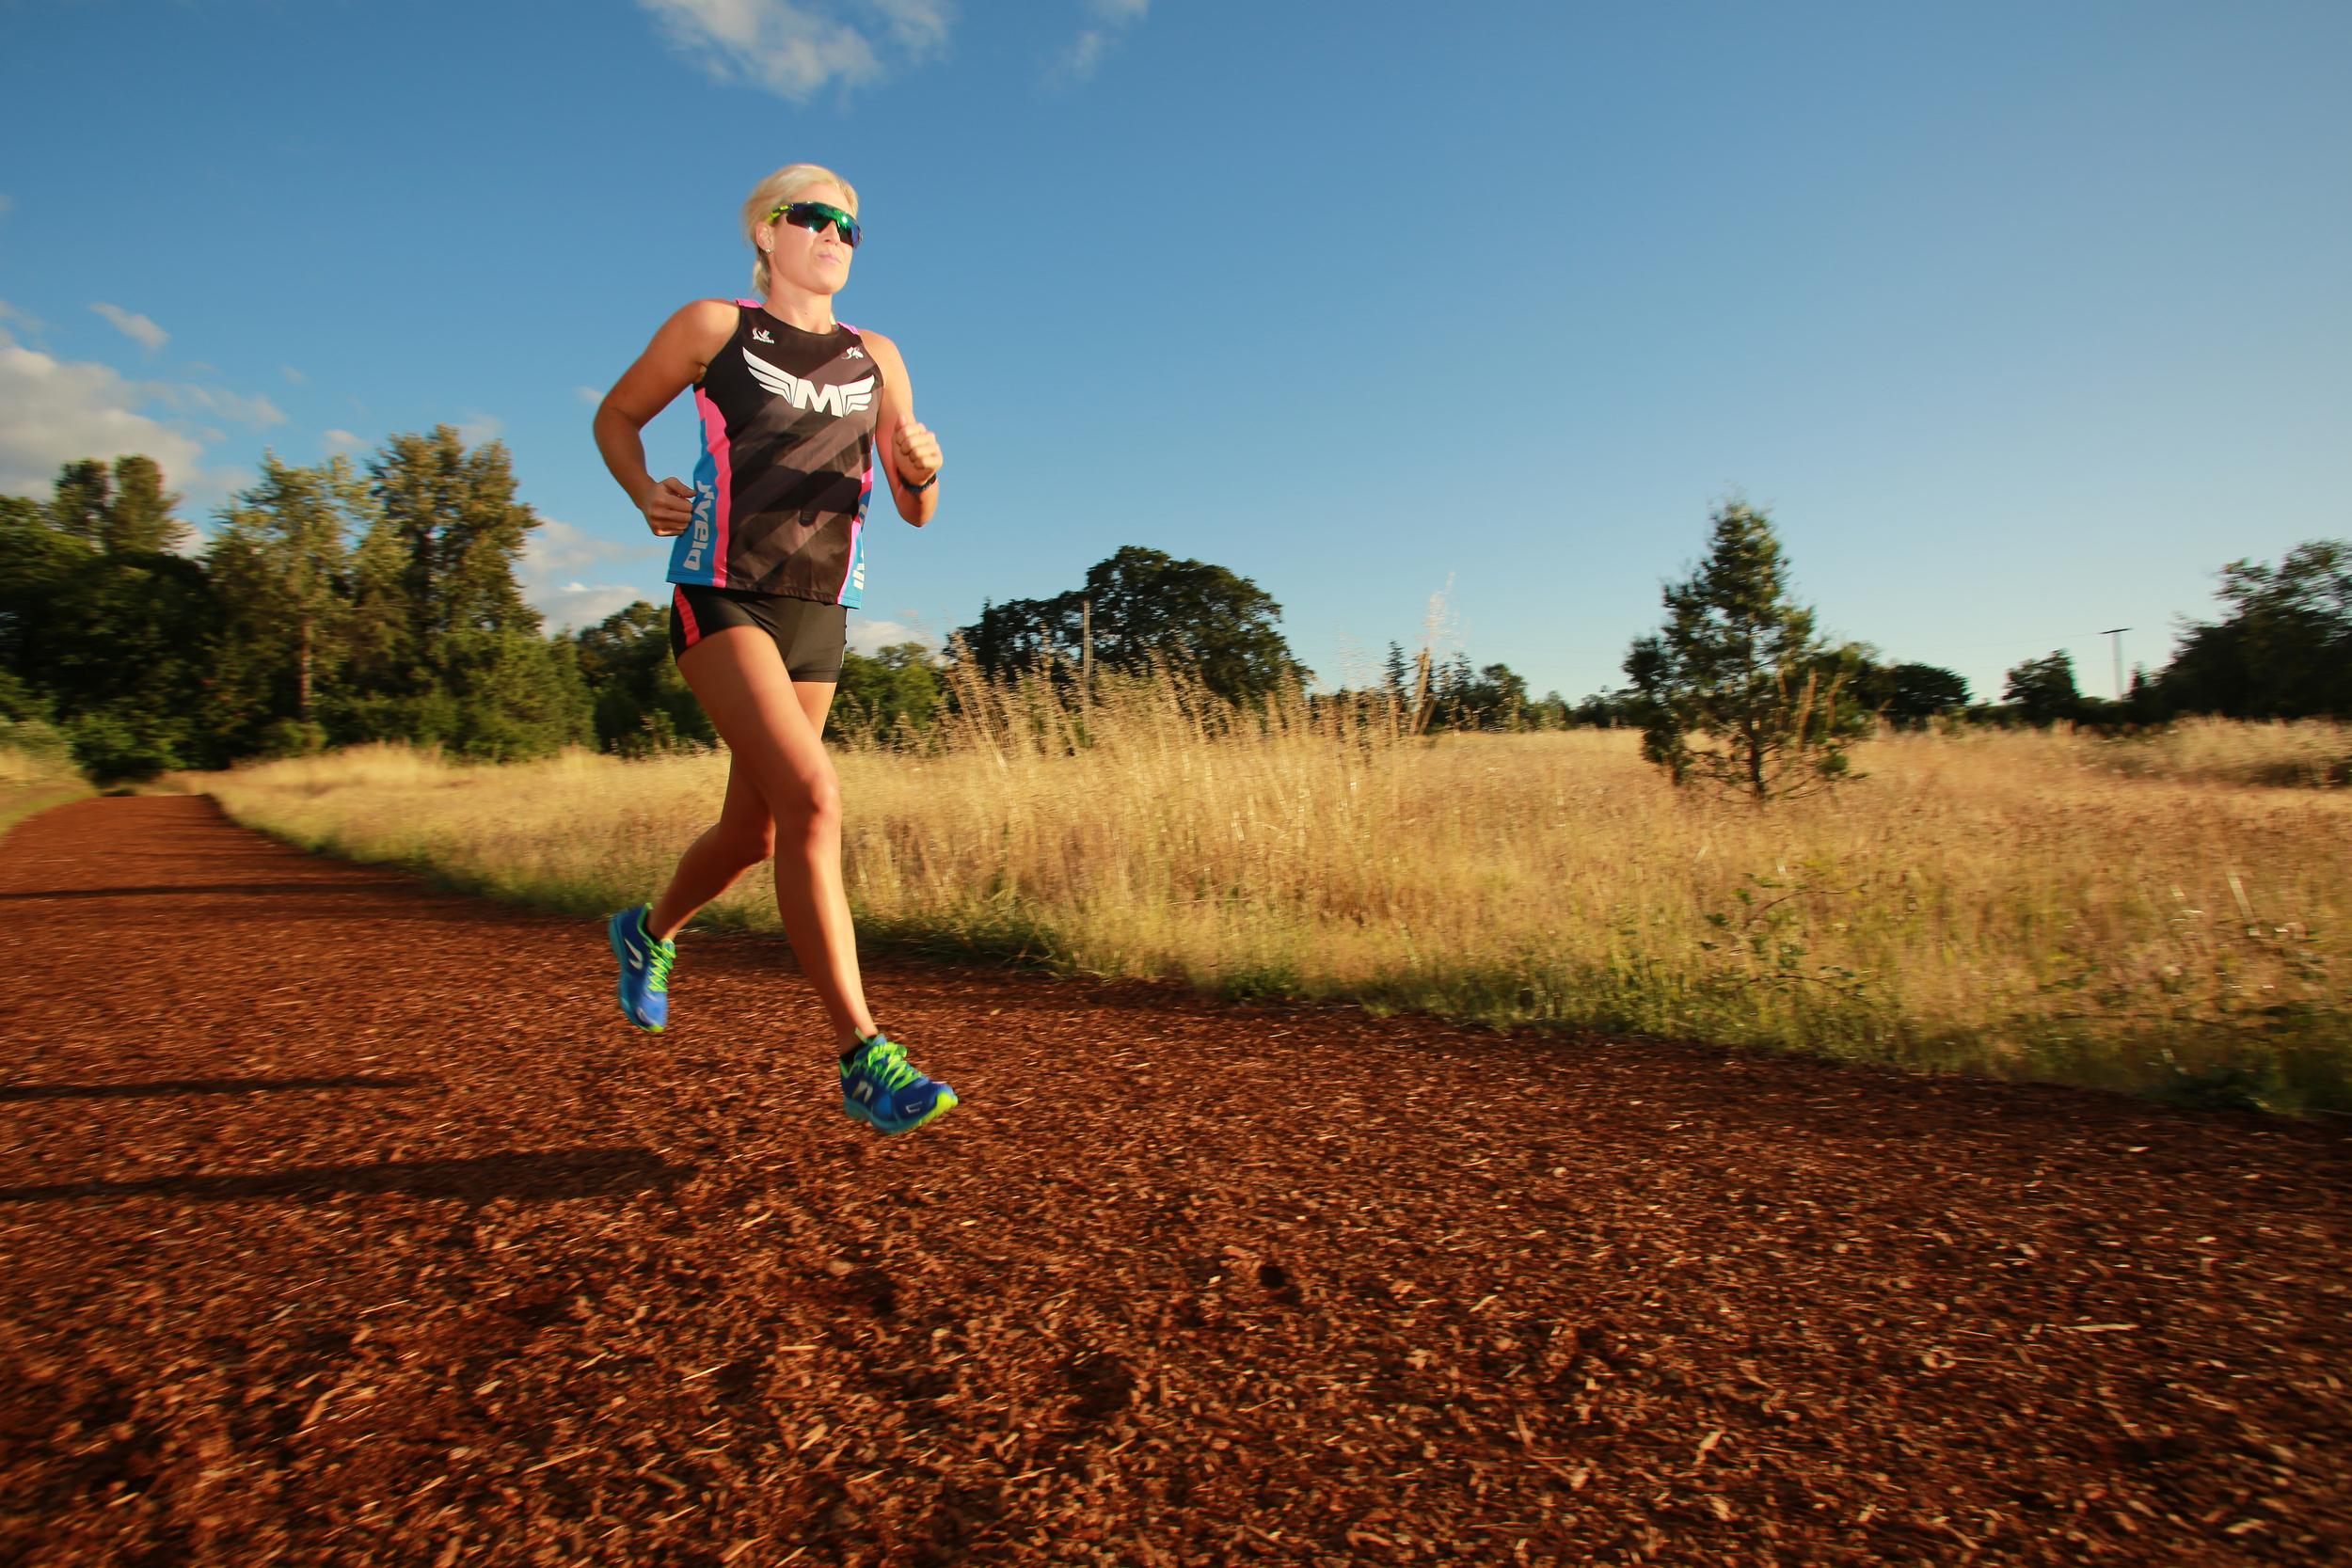 Mackenzie Madison, professional triathlete